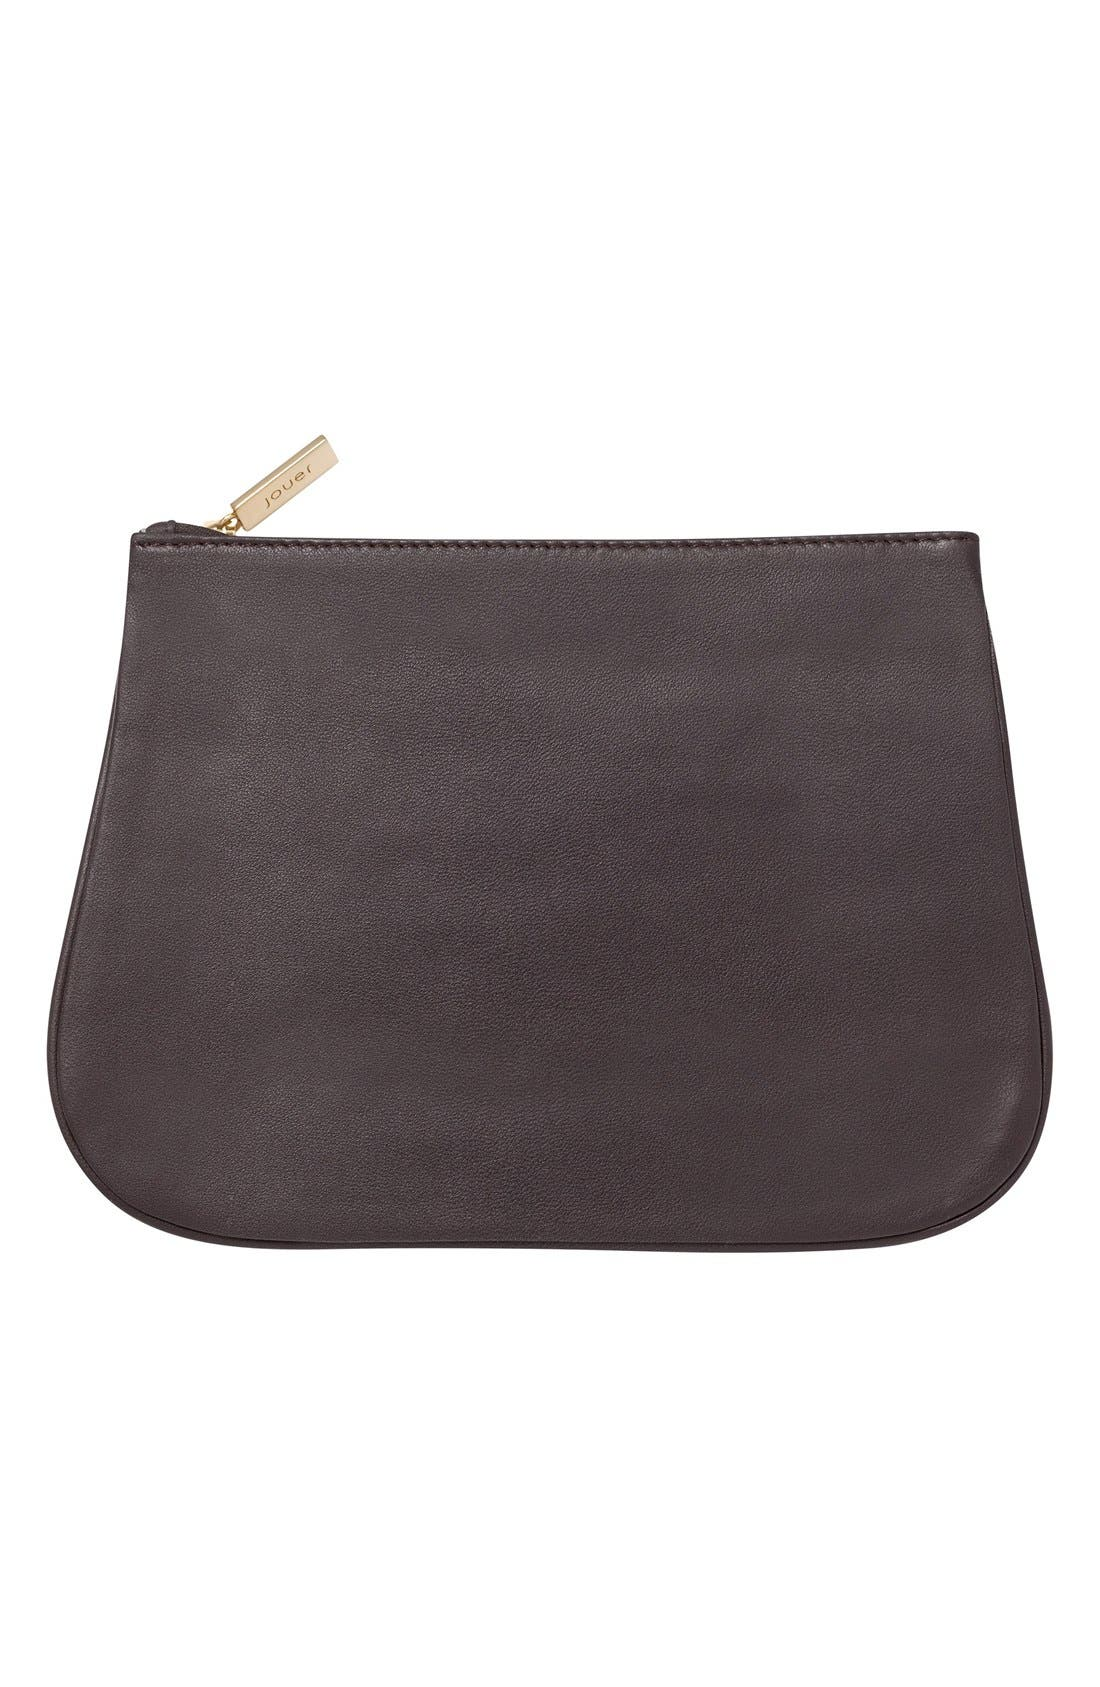 'IT - Chocolate' Cosmetics Bag,                         Main,                         color, 200